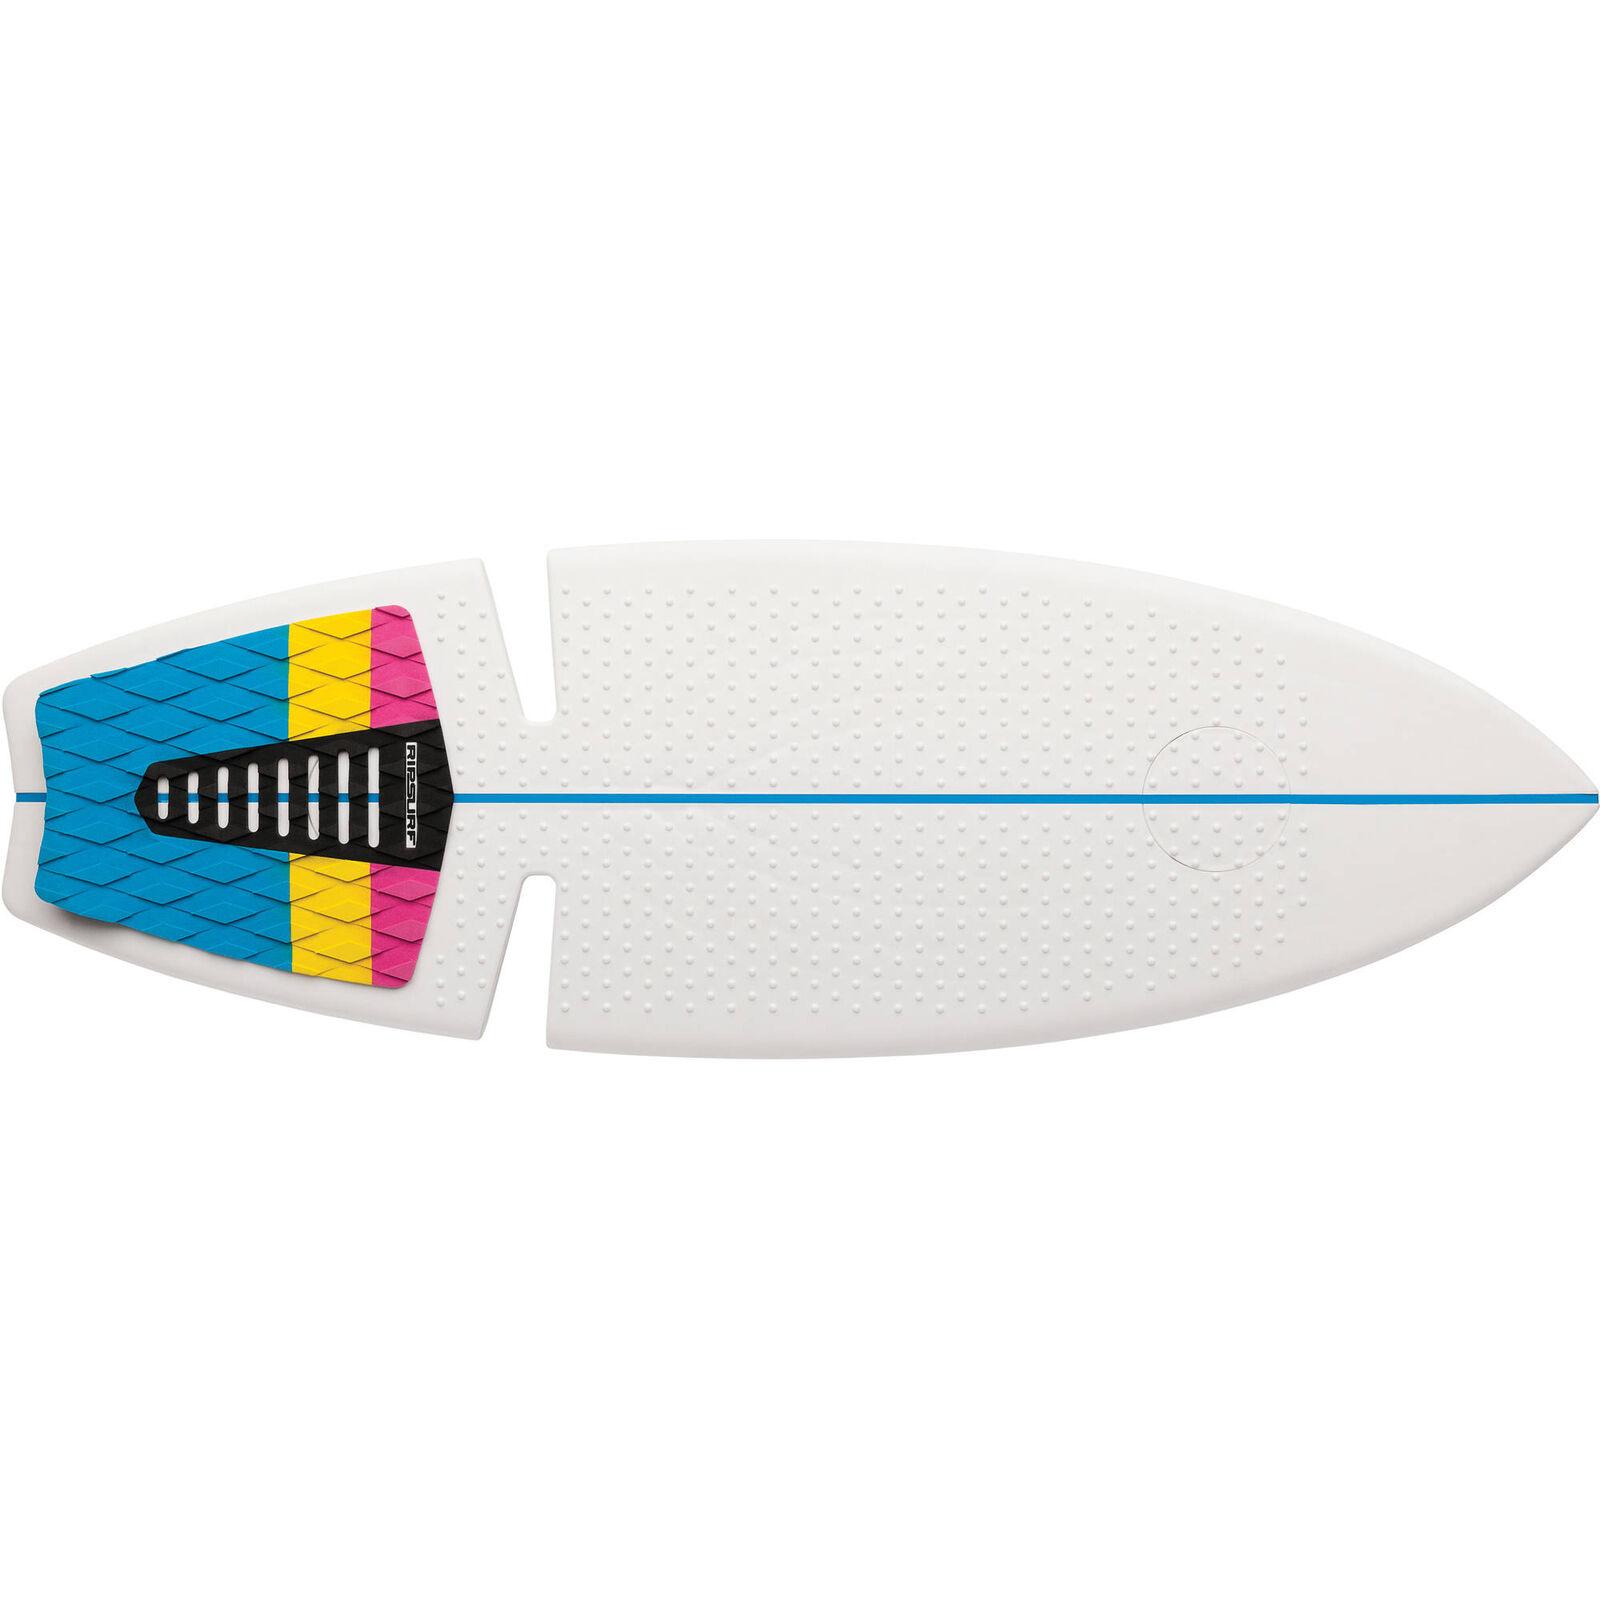 Razor RipSurf CMYK Lightweight Shoreboard Ripstik Dry Land Surfboard Board